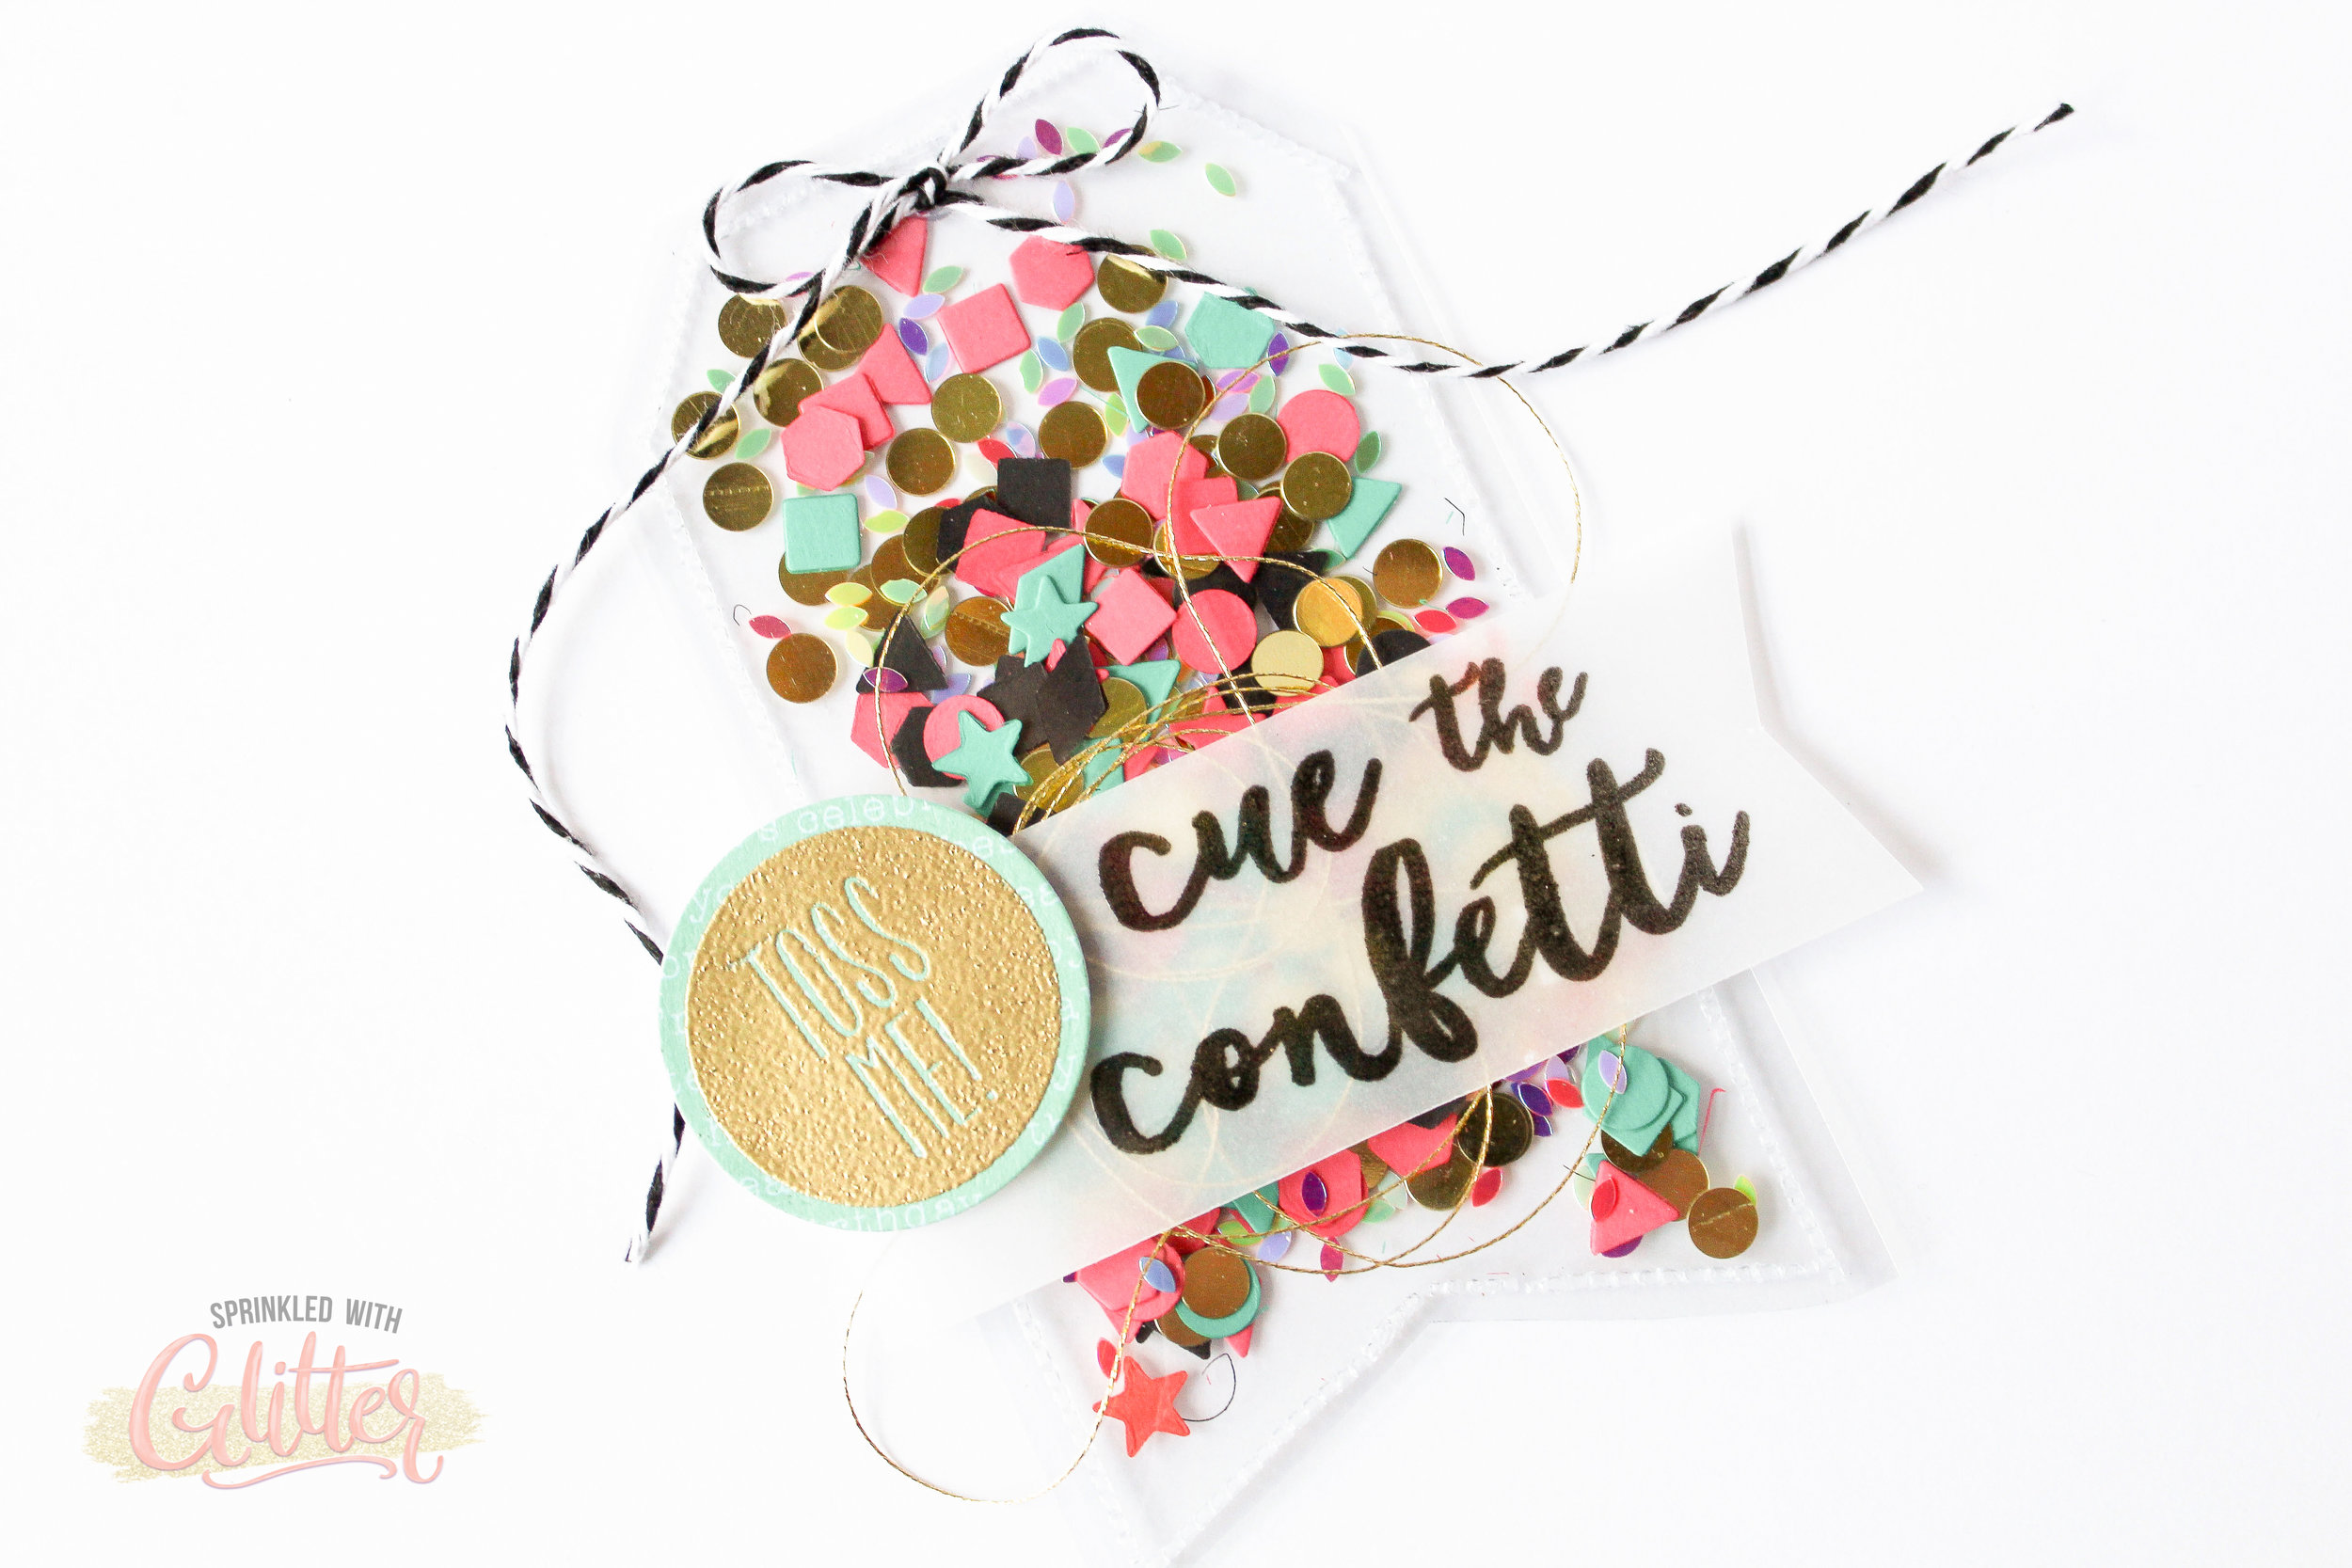 Confetti shaker tags watermark-10.jpg